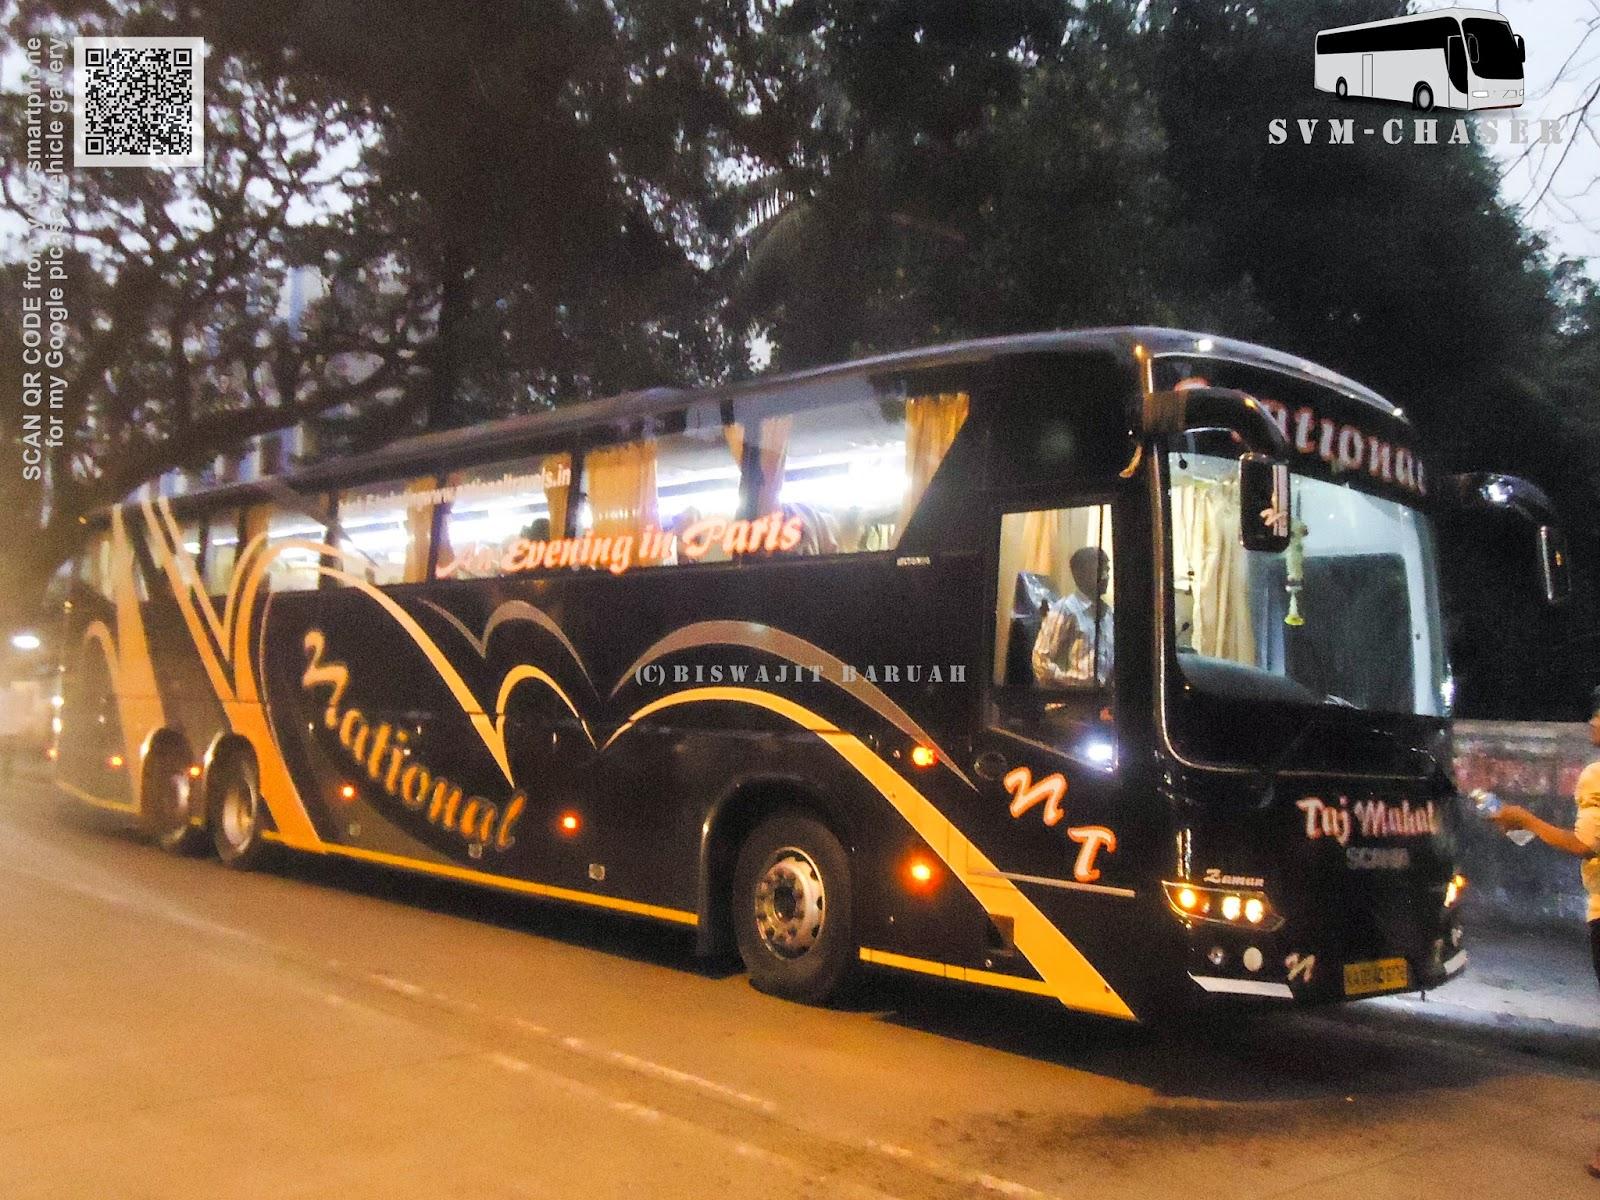 National Scania Metrolink Hd Multiaxle Biswajit Svm Chaser